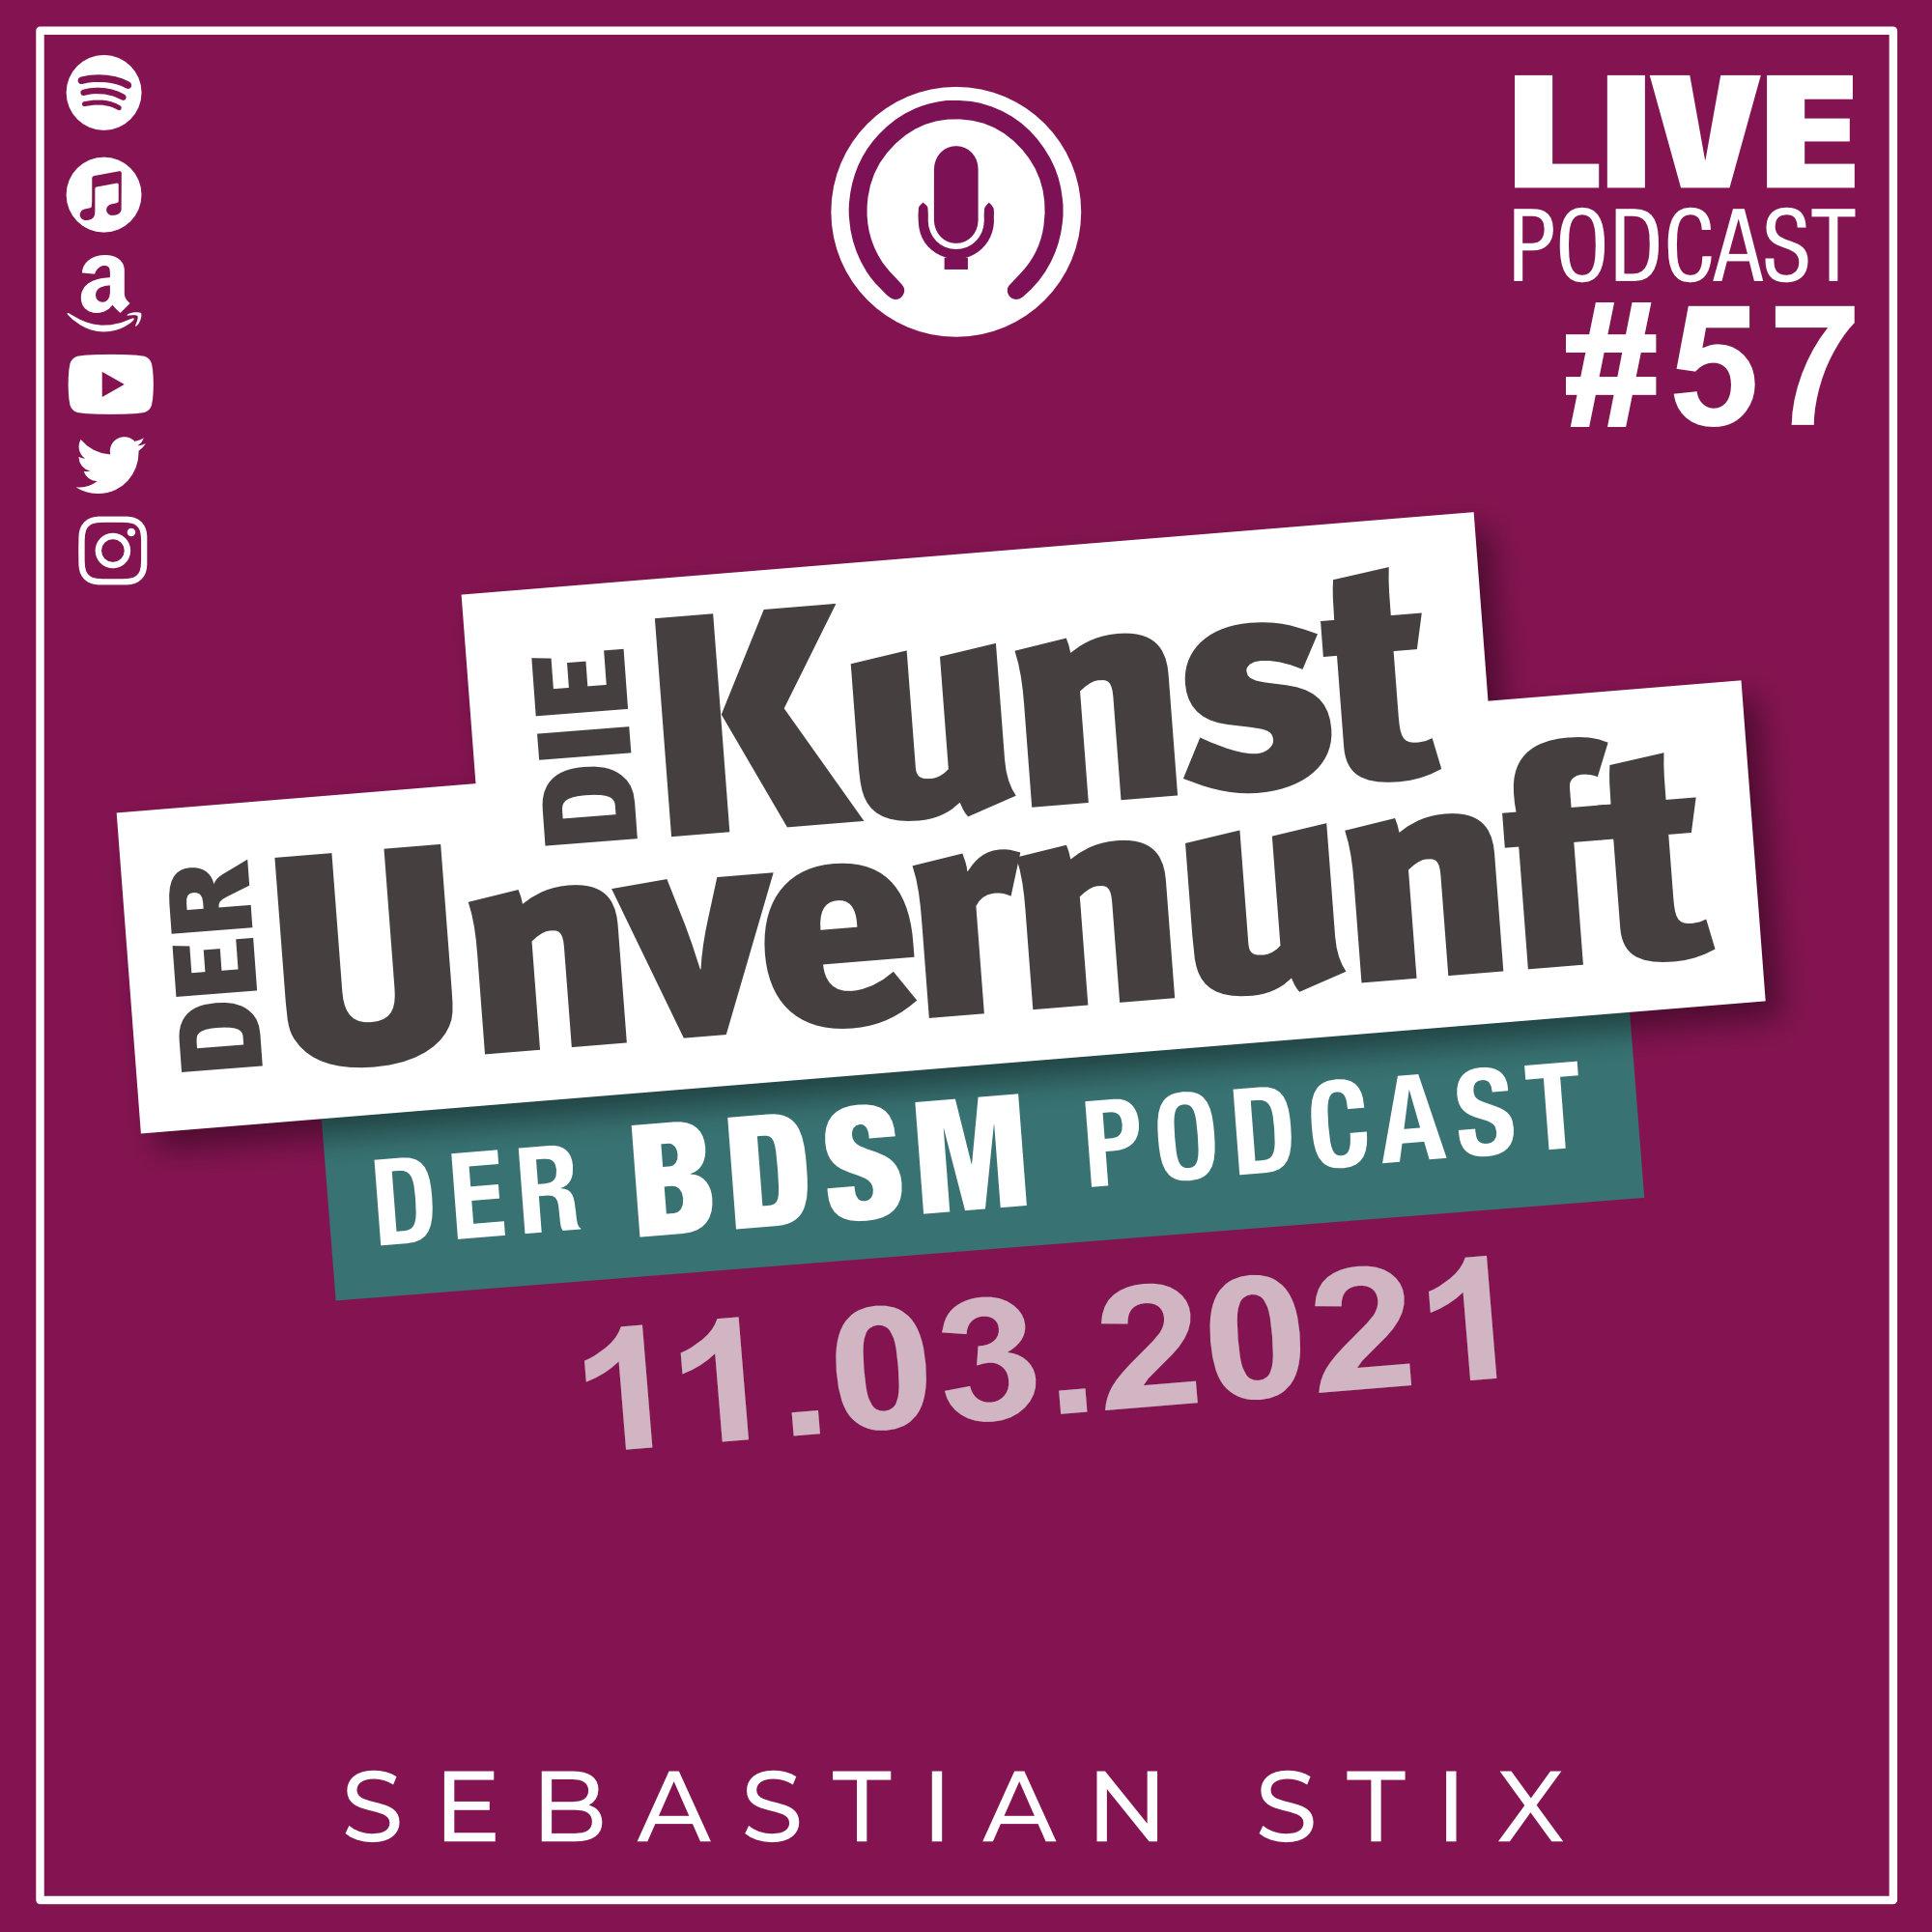 Unvernunft Live 11.03.2021 - Desi's Chronik